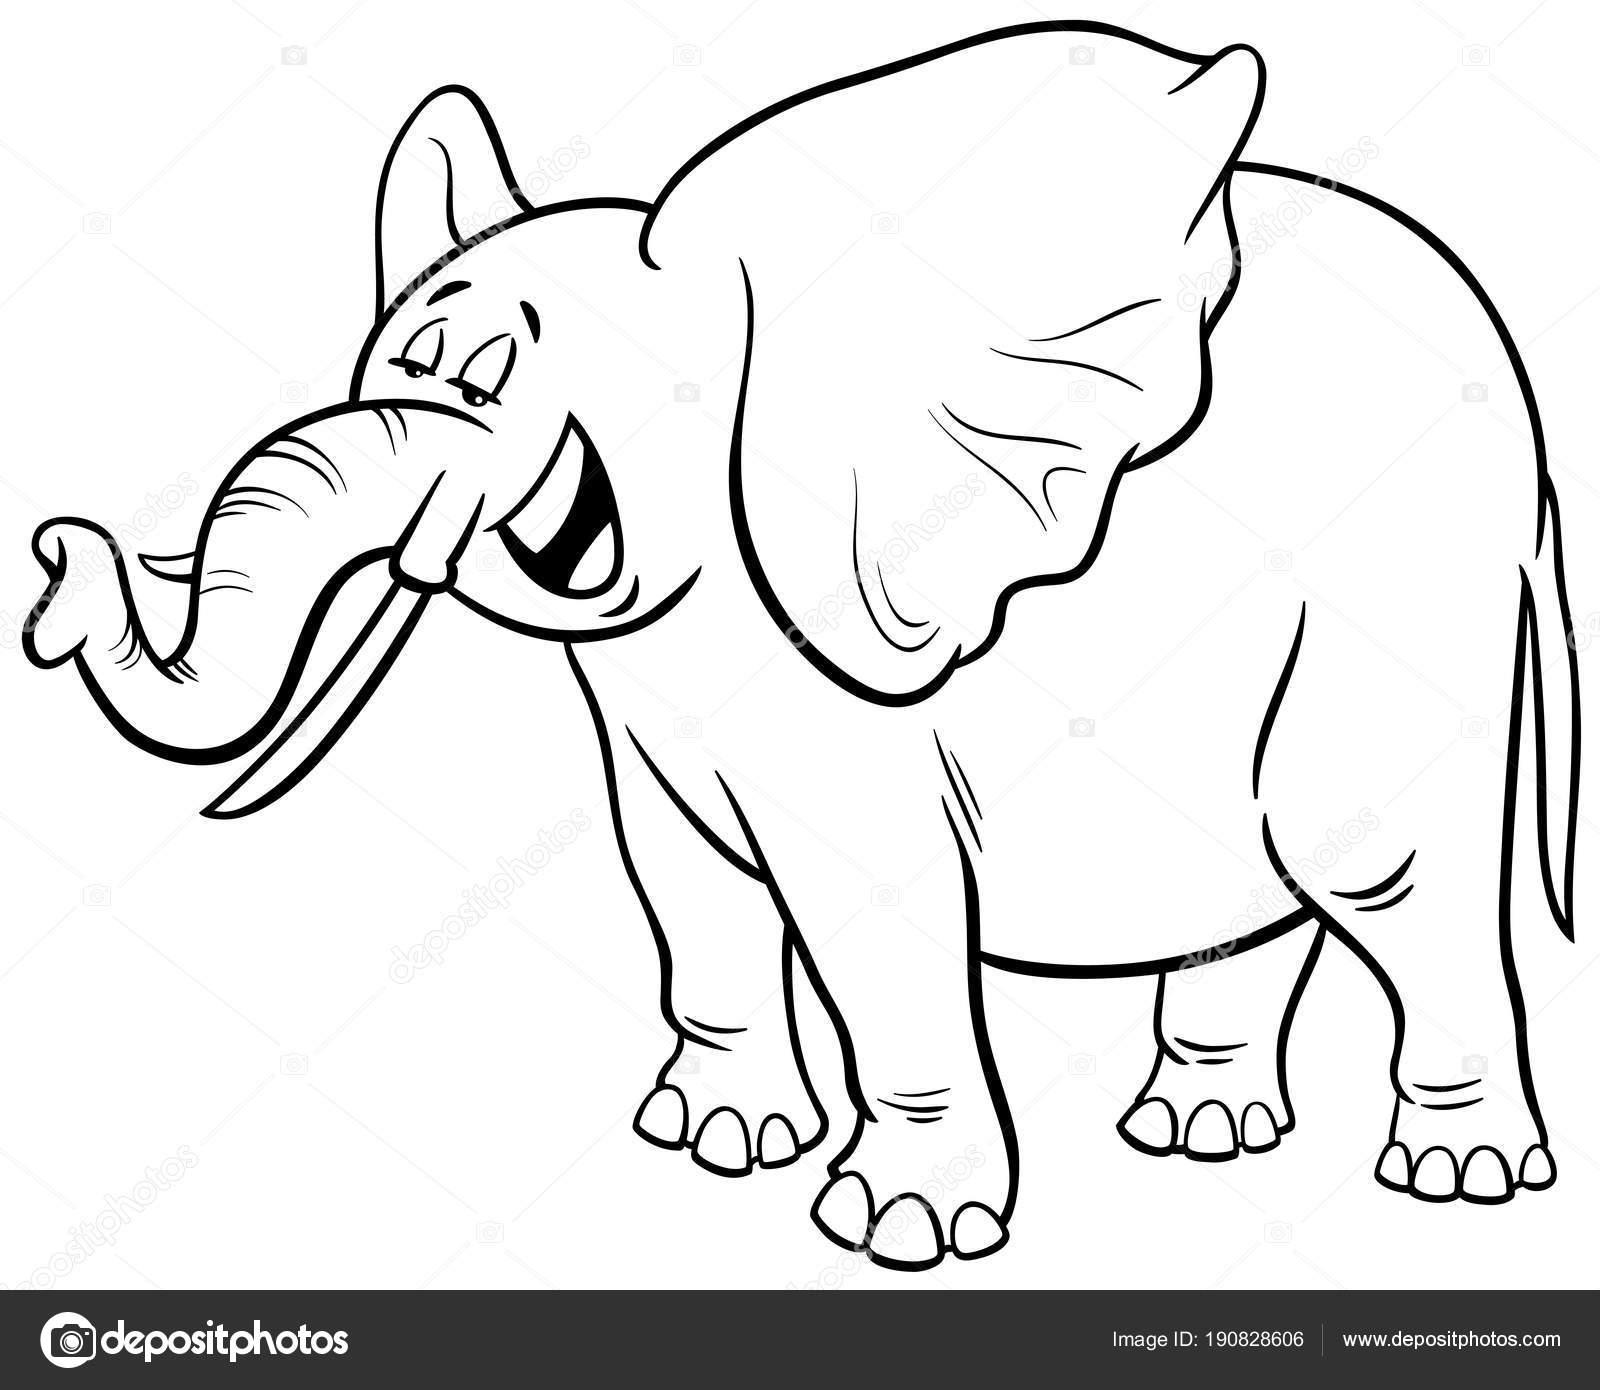 Dibujos Elefante Africano Dibujo Libro De Colorear De Personaje